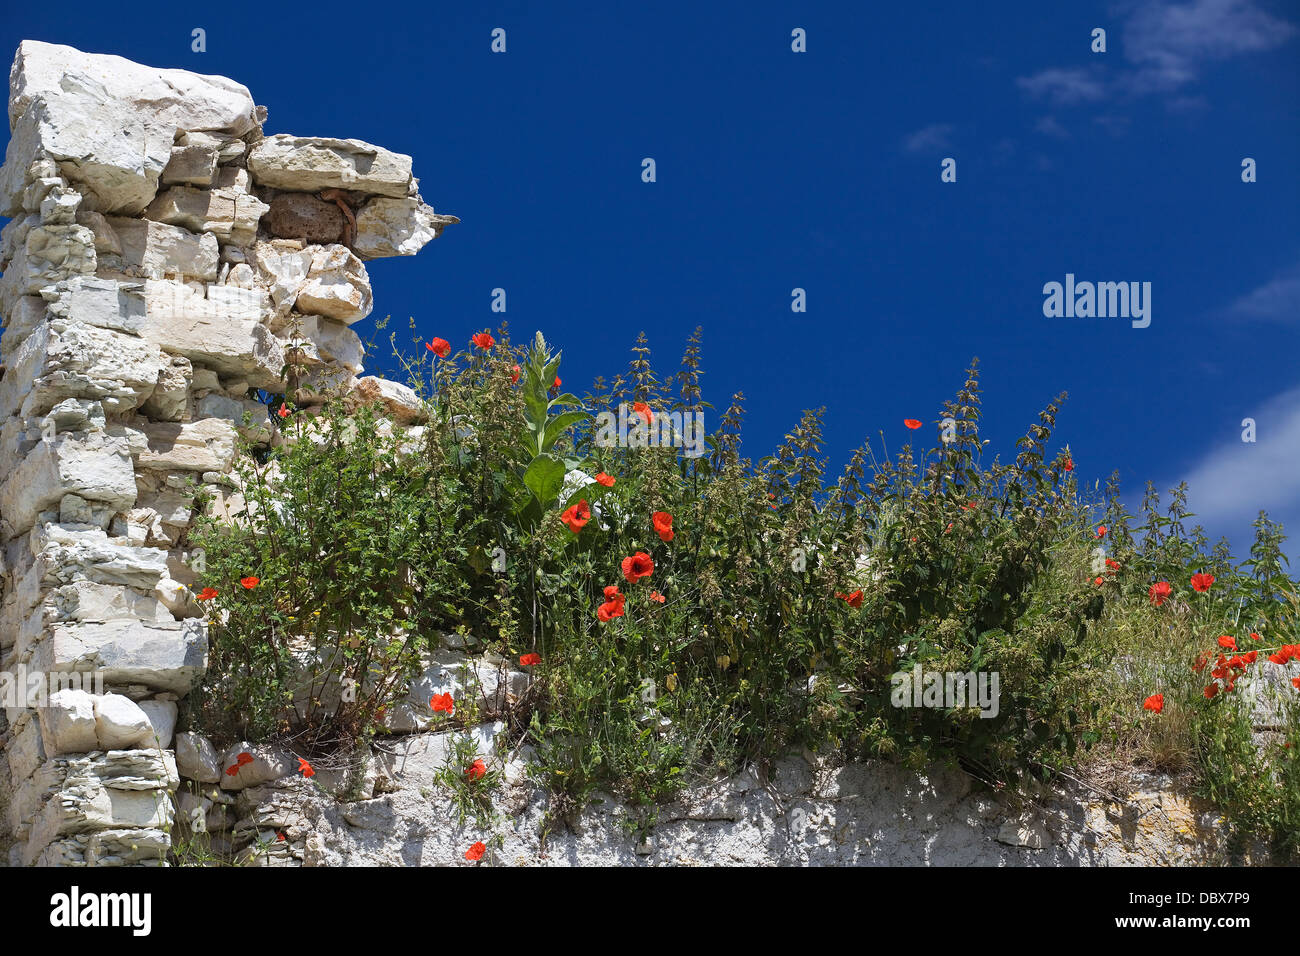 Monti Sibillini - Wild flowers - Italy - Stock Image